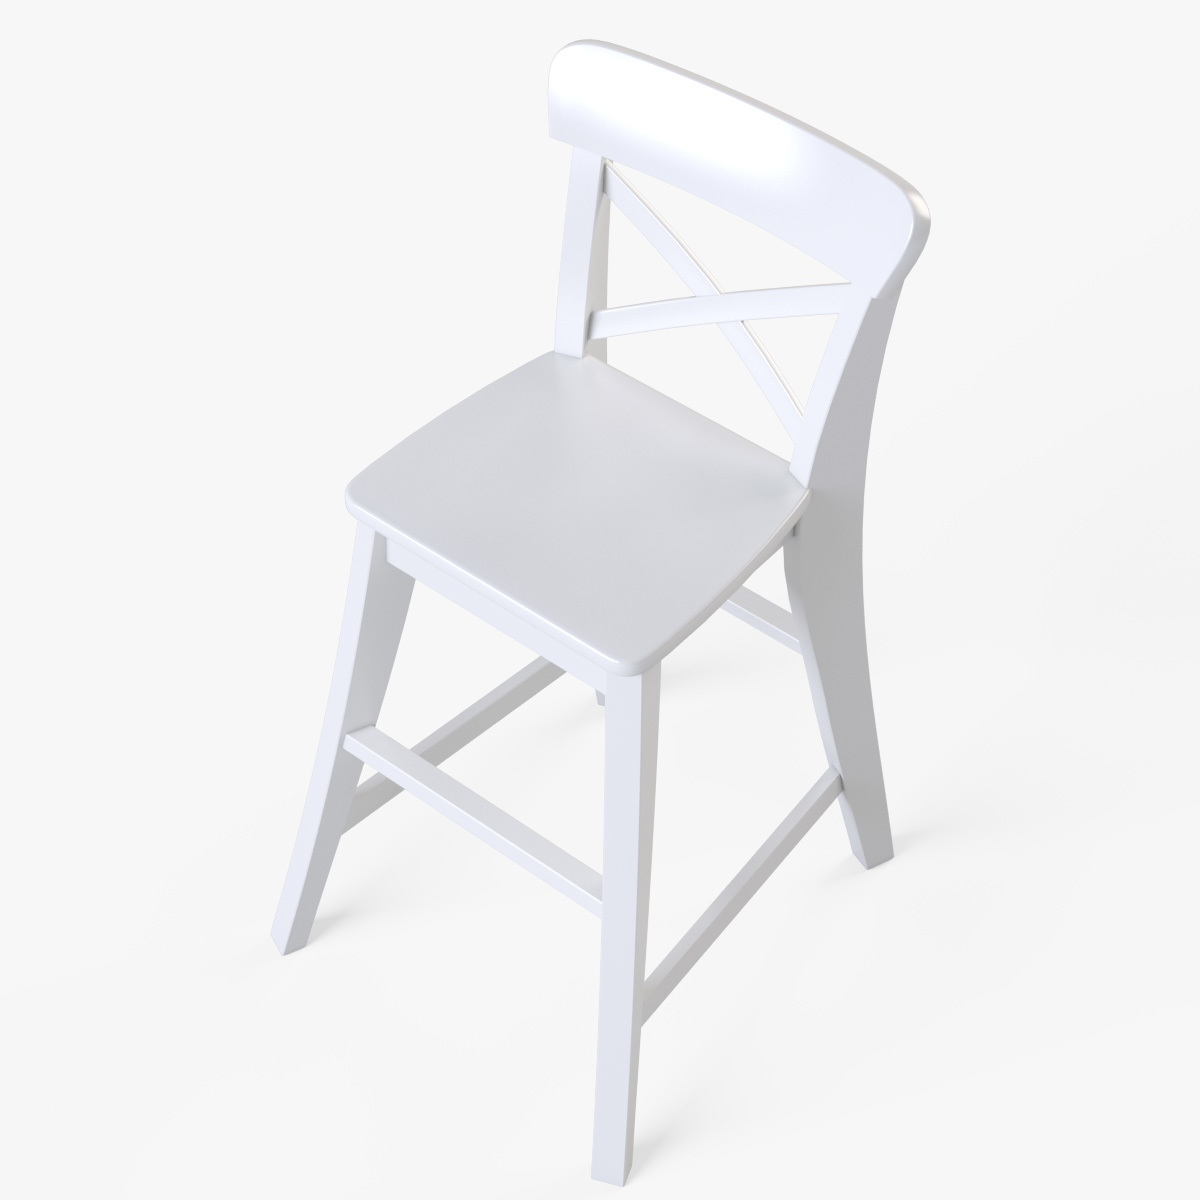 ikea junior chair outdoor bar ingolf white by markelos 3docean